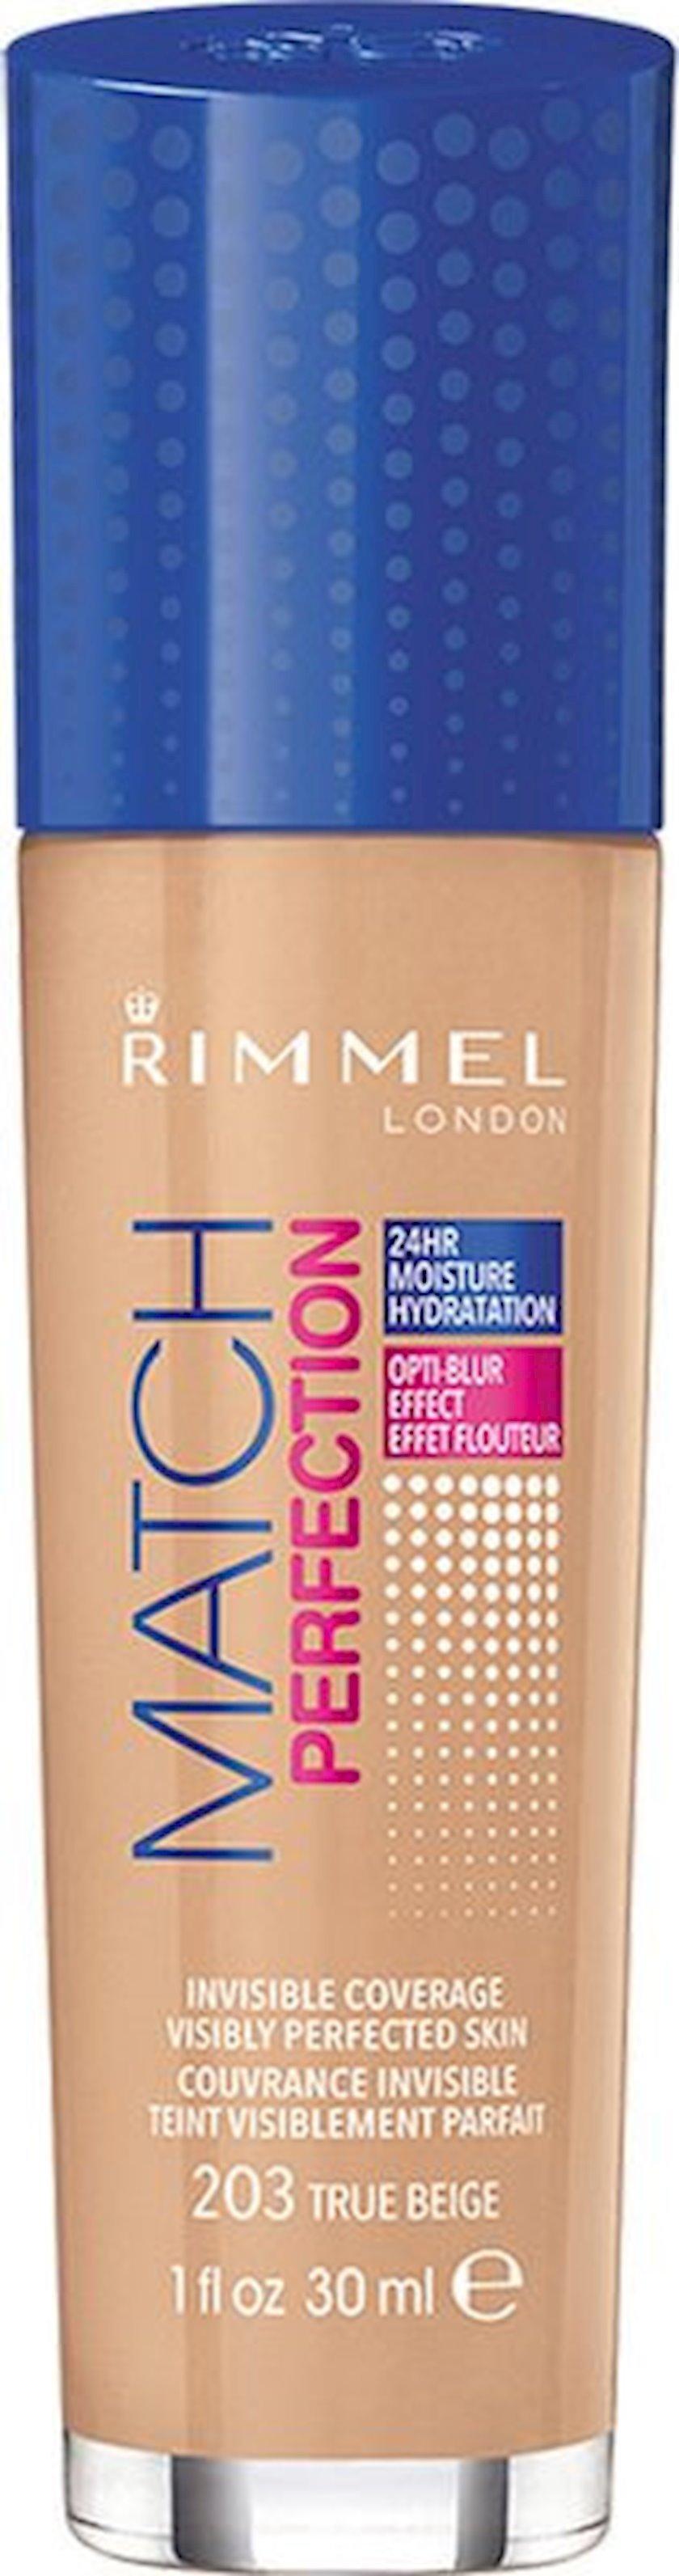 Tonal krem Rimmel Match Perfection Foundation ton 203 True Beige 30 ml